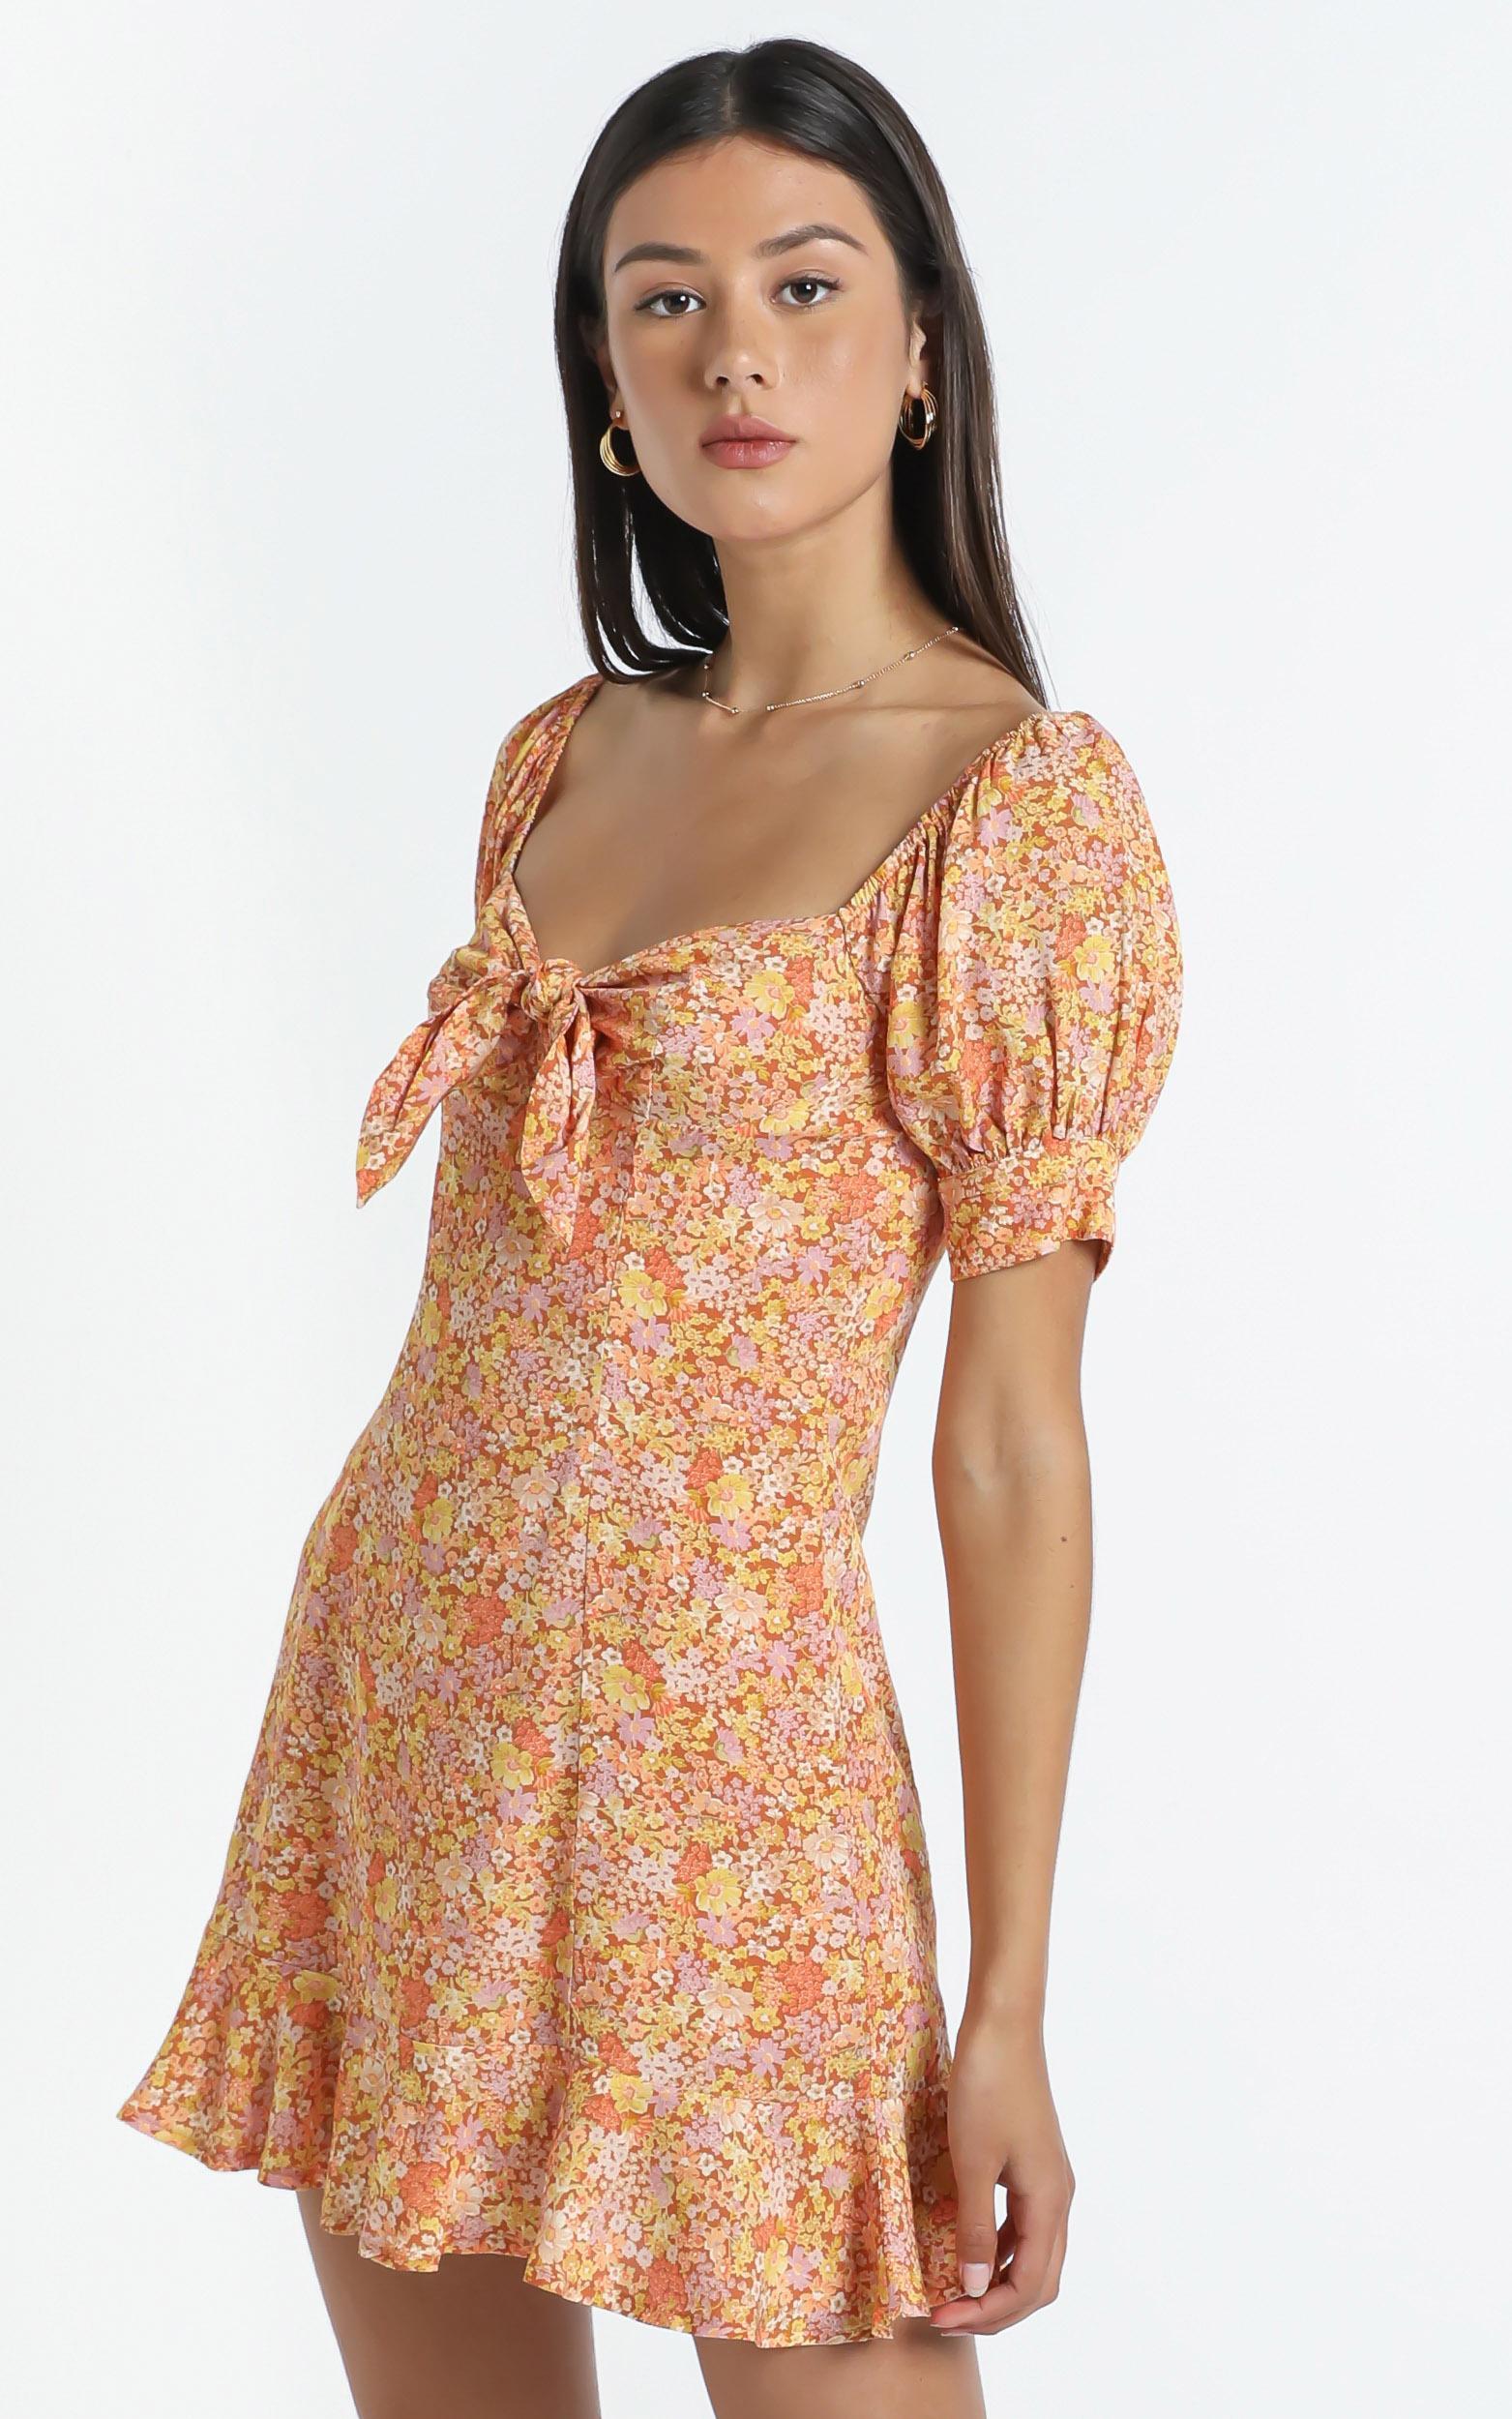 Rosa Dress in Blushing Floral - 14 (XL), Orange, hi-res image number null